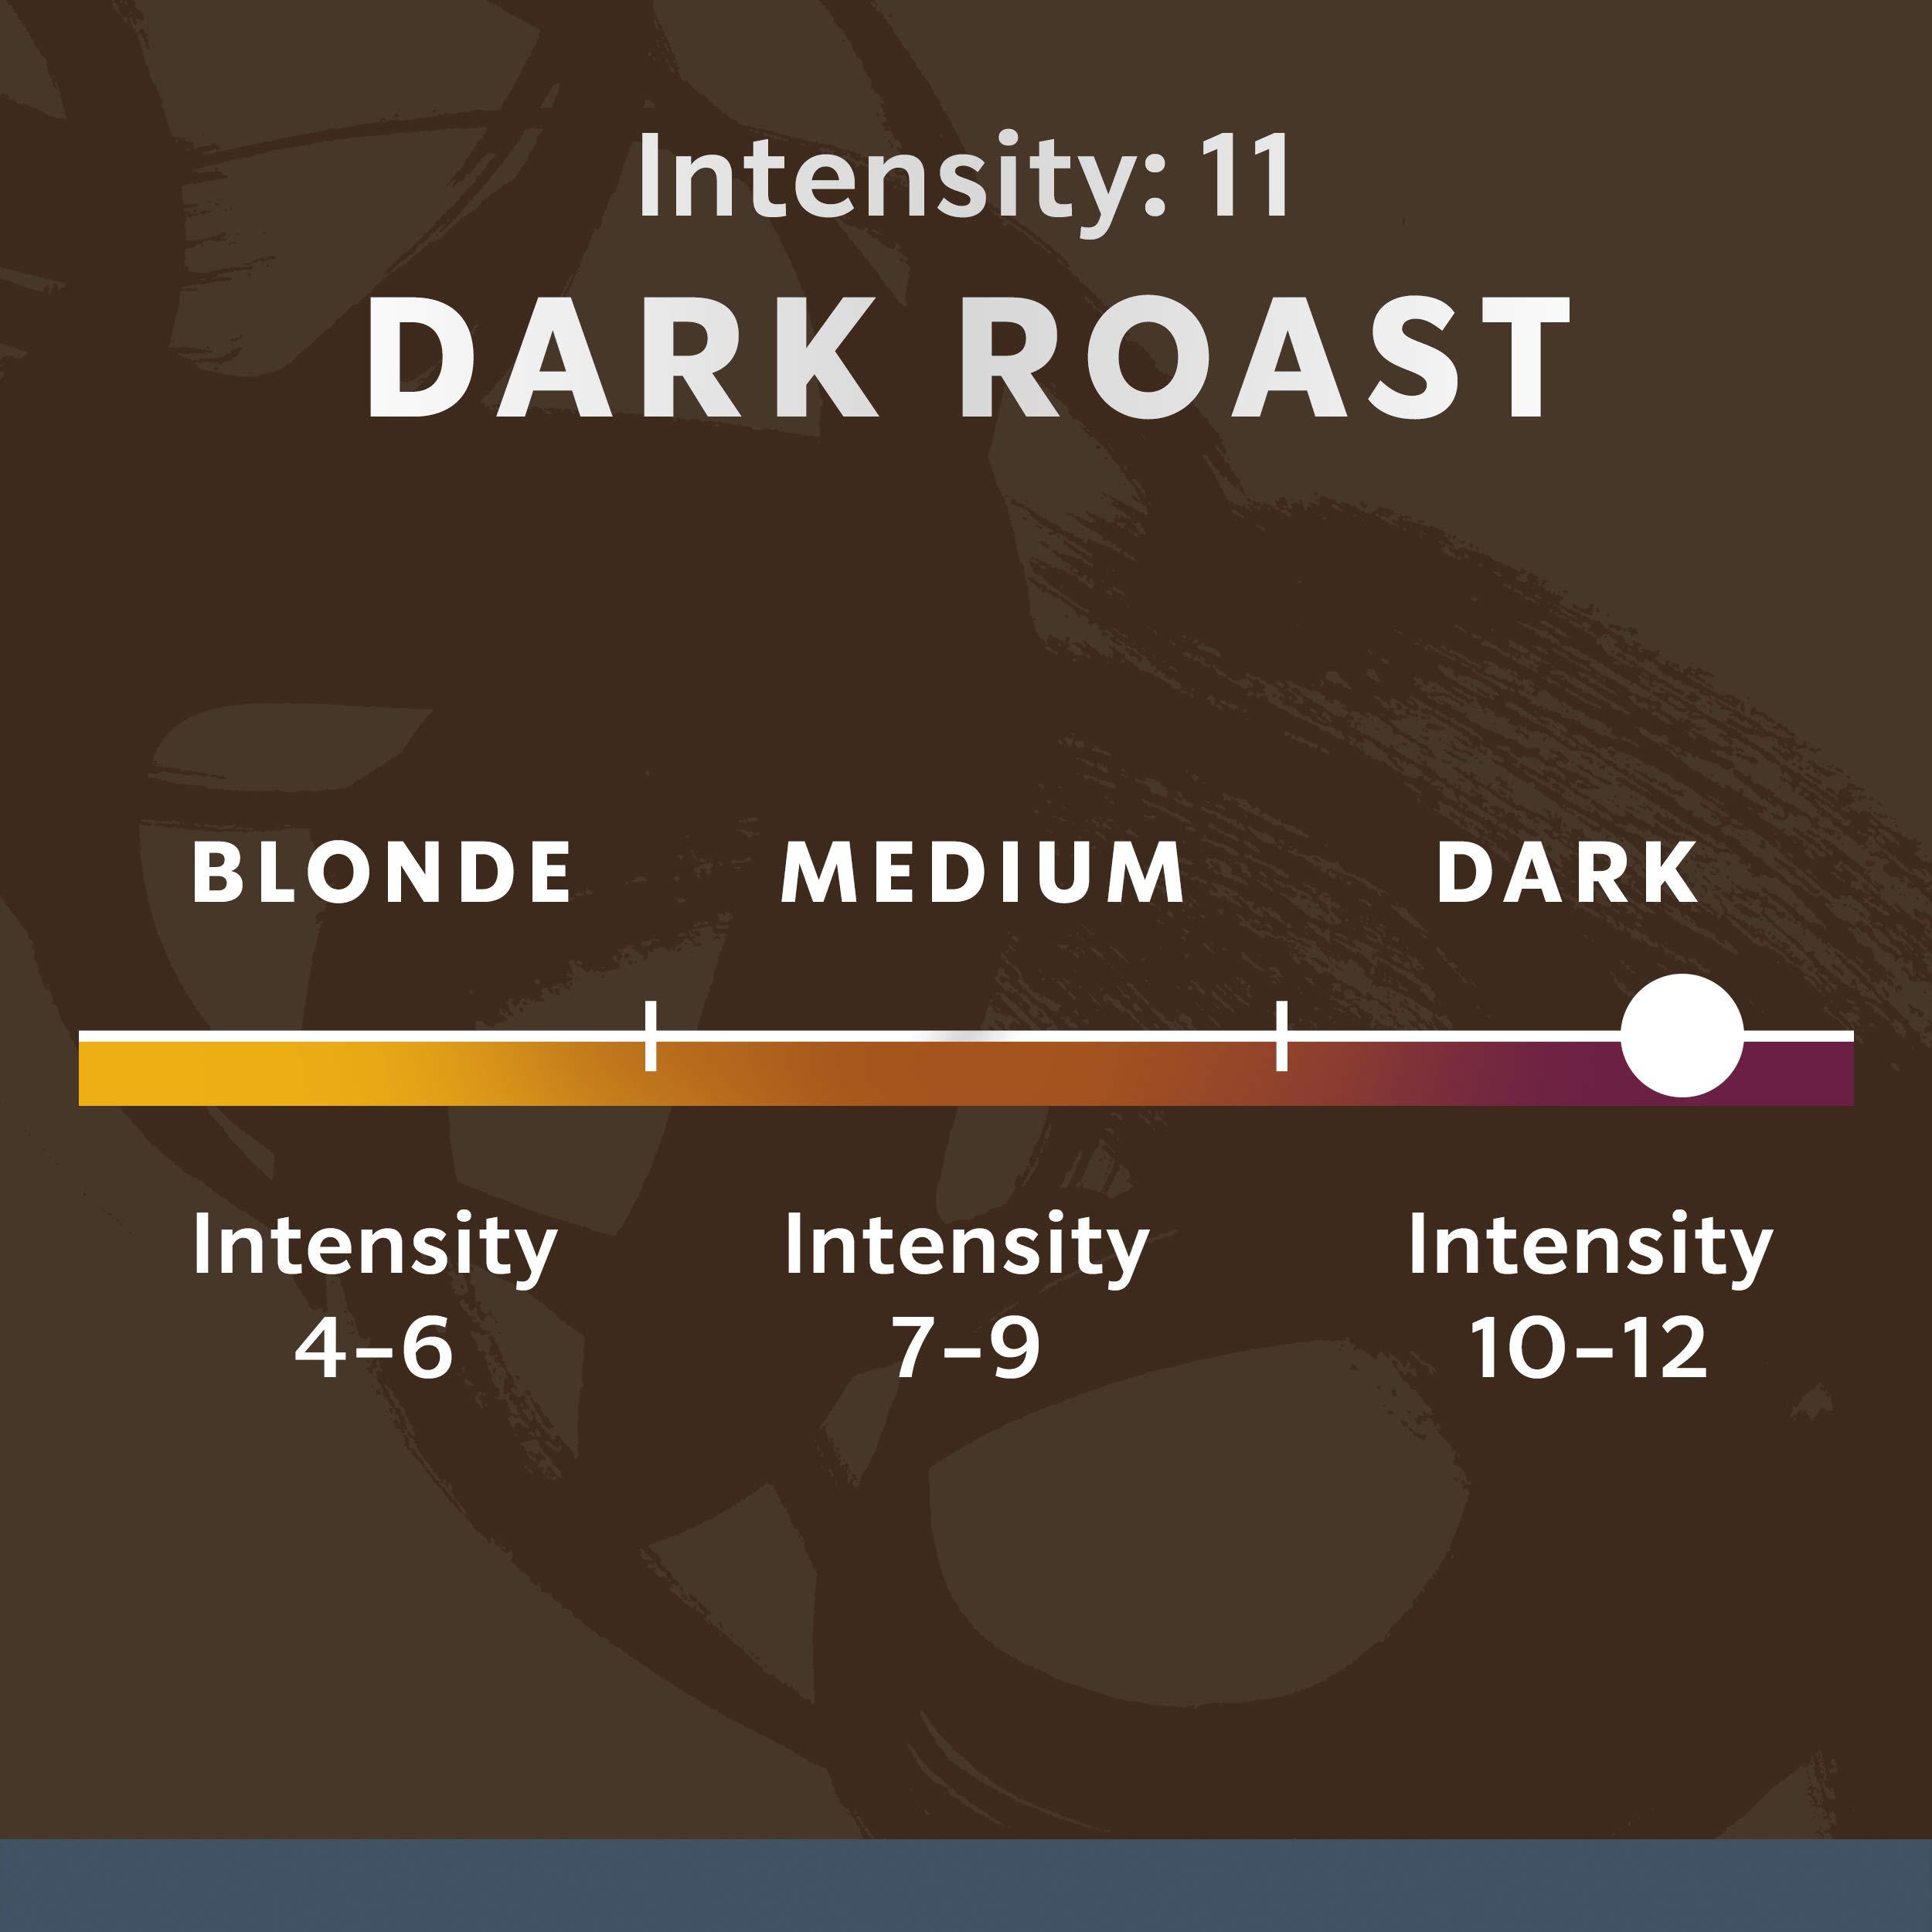 Starbucks by Nespresso, Espresso Dark Roast (50-count single serve capsules, compatible with Nespresso Original Line System) by Starbucks for Nespresso (Image #4)